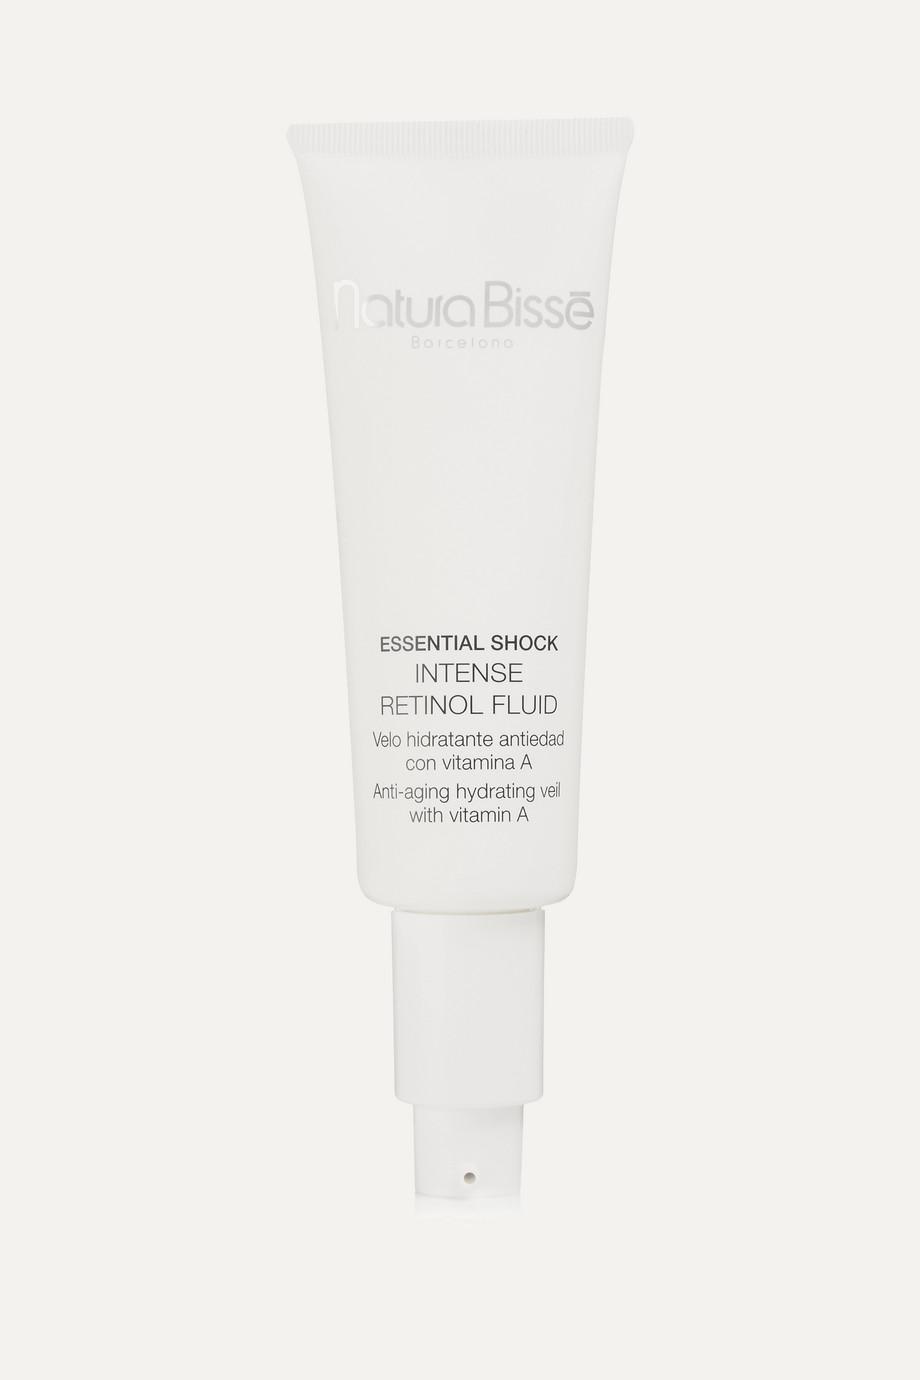 Natura Bissé Essential Shock Intense Retinol Fluid, 50ml